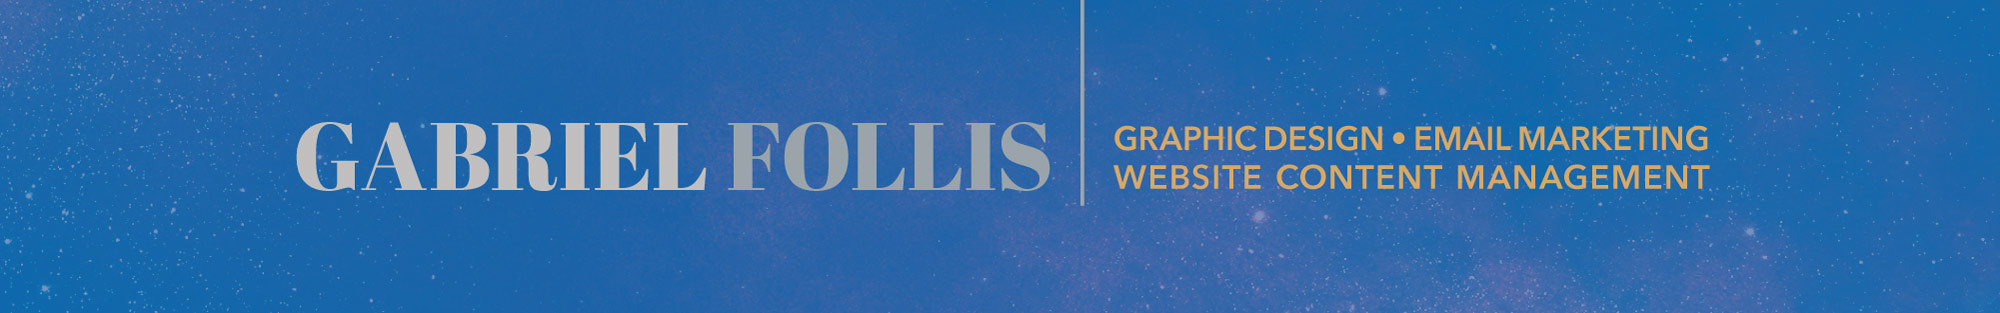 Gabriel Follis - Graphic Design + Email/Web Marketing